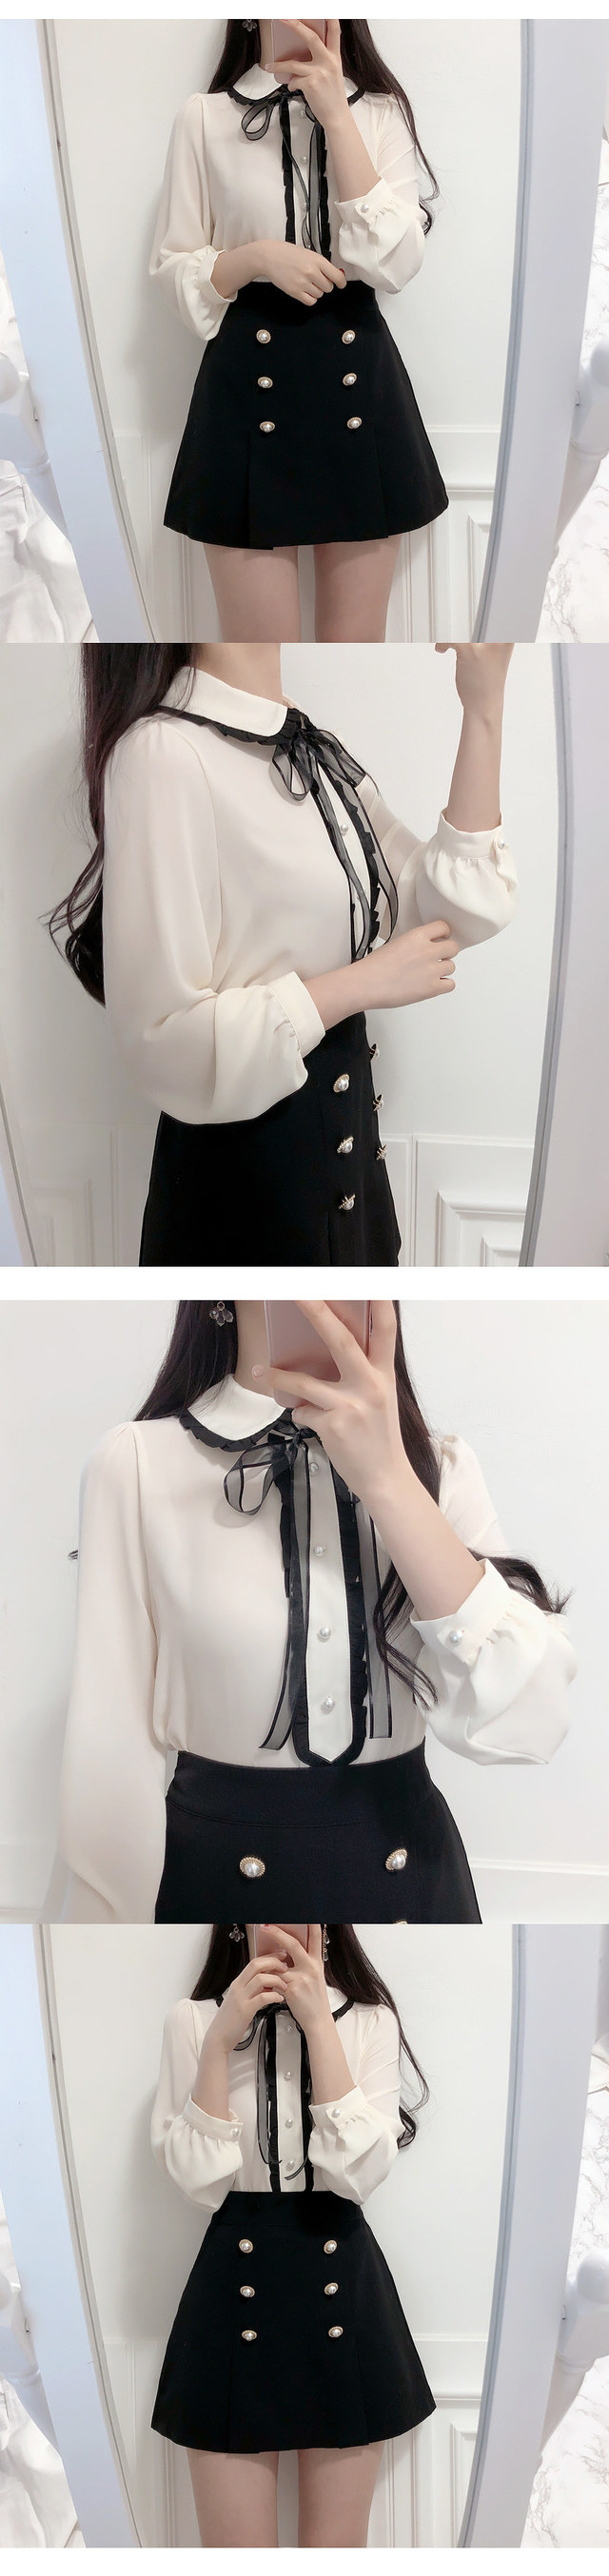 Pearl ruffle blouse